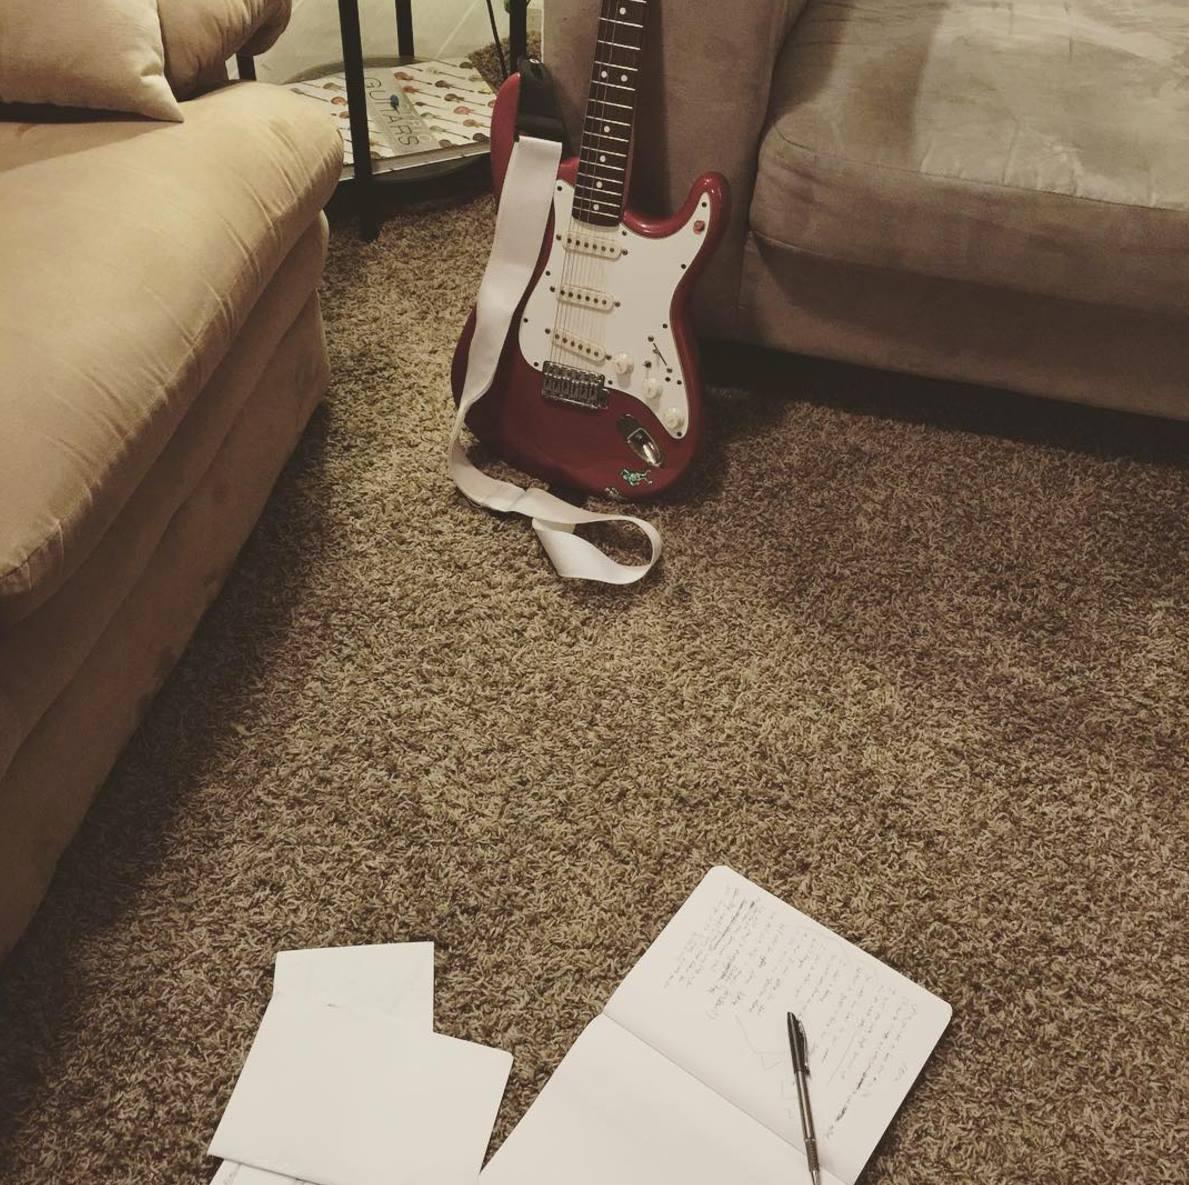 12.24.2015 writing Vera alone on Christmas Eve